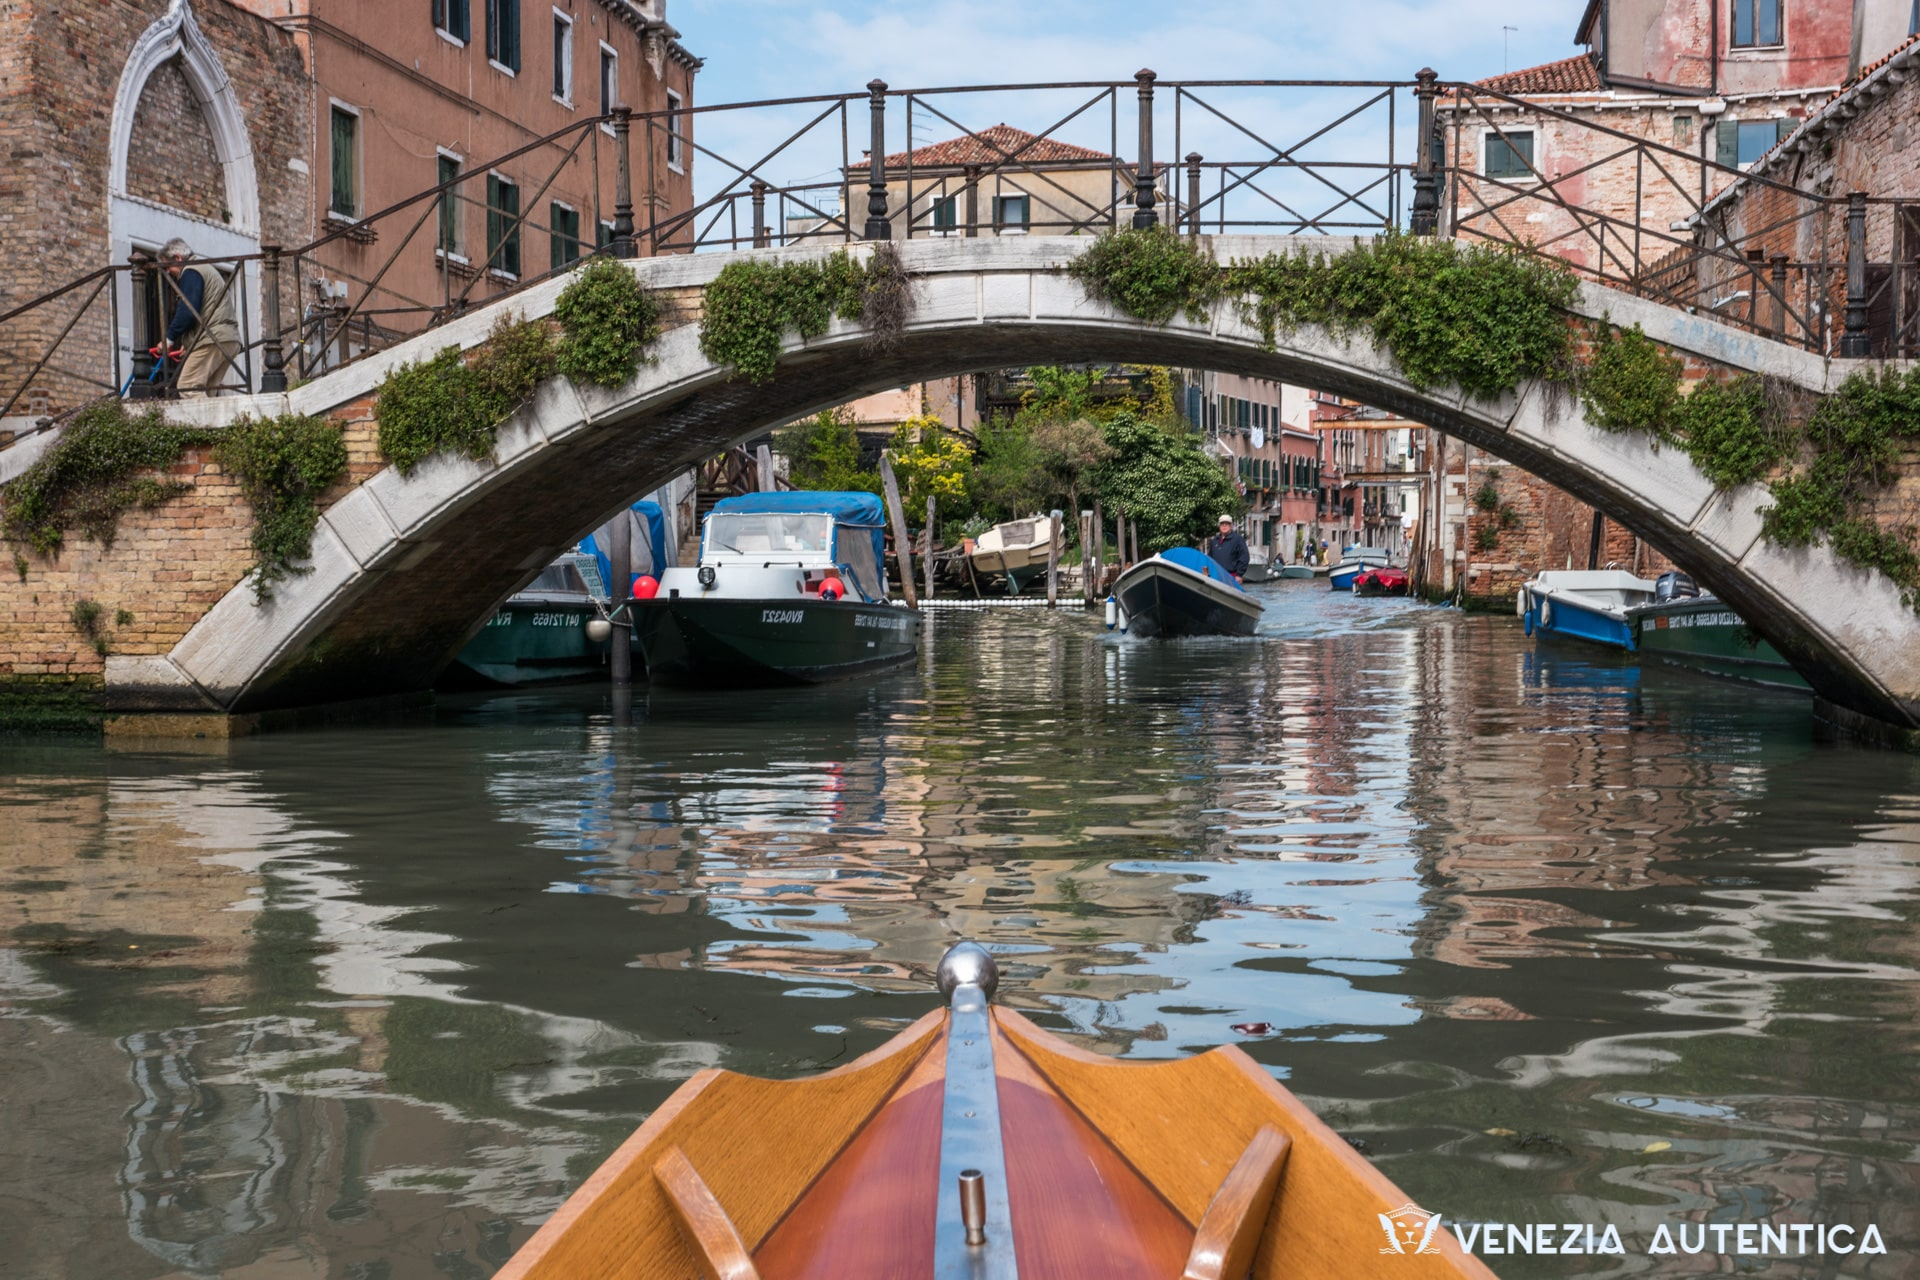 Travel Consultant Services in Venice, Italy, Venezia Autentica